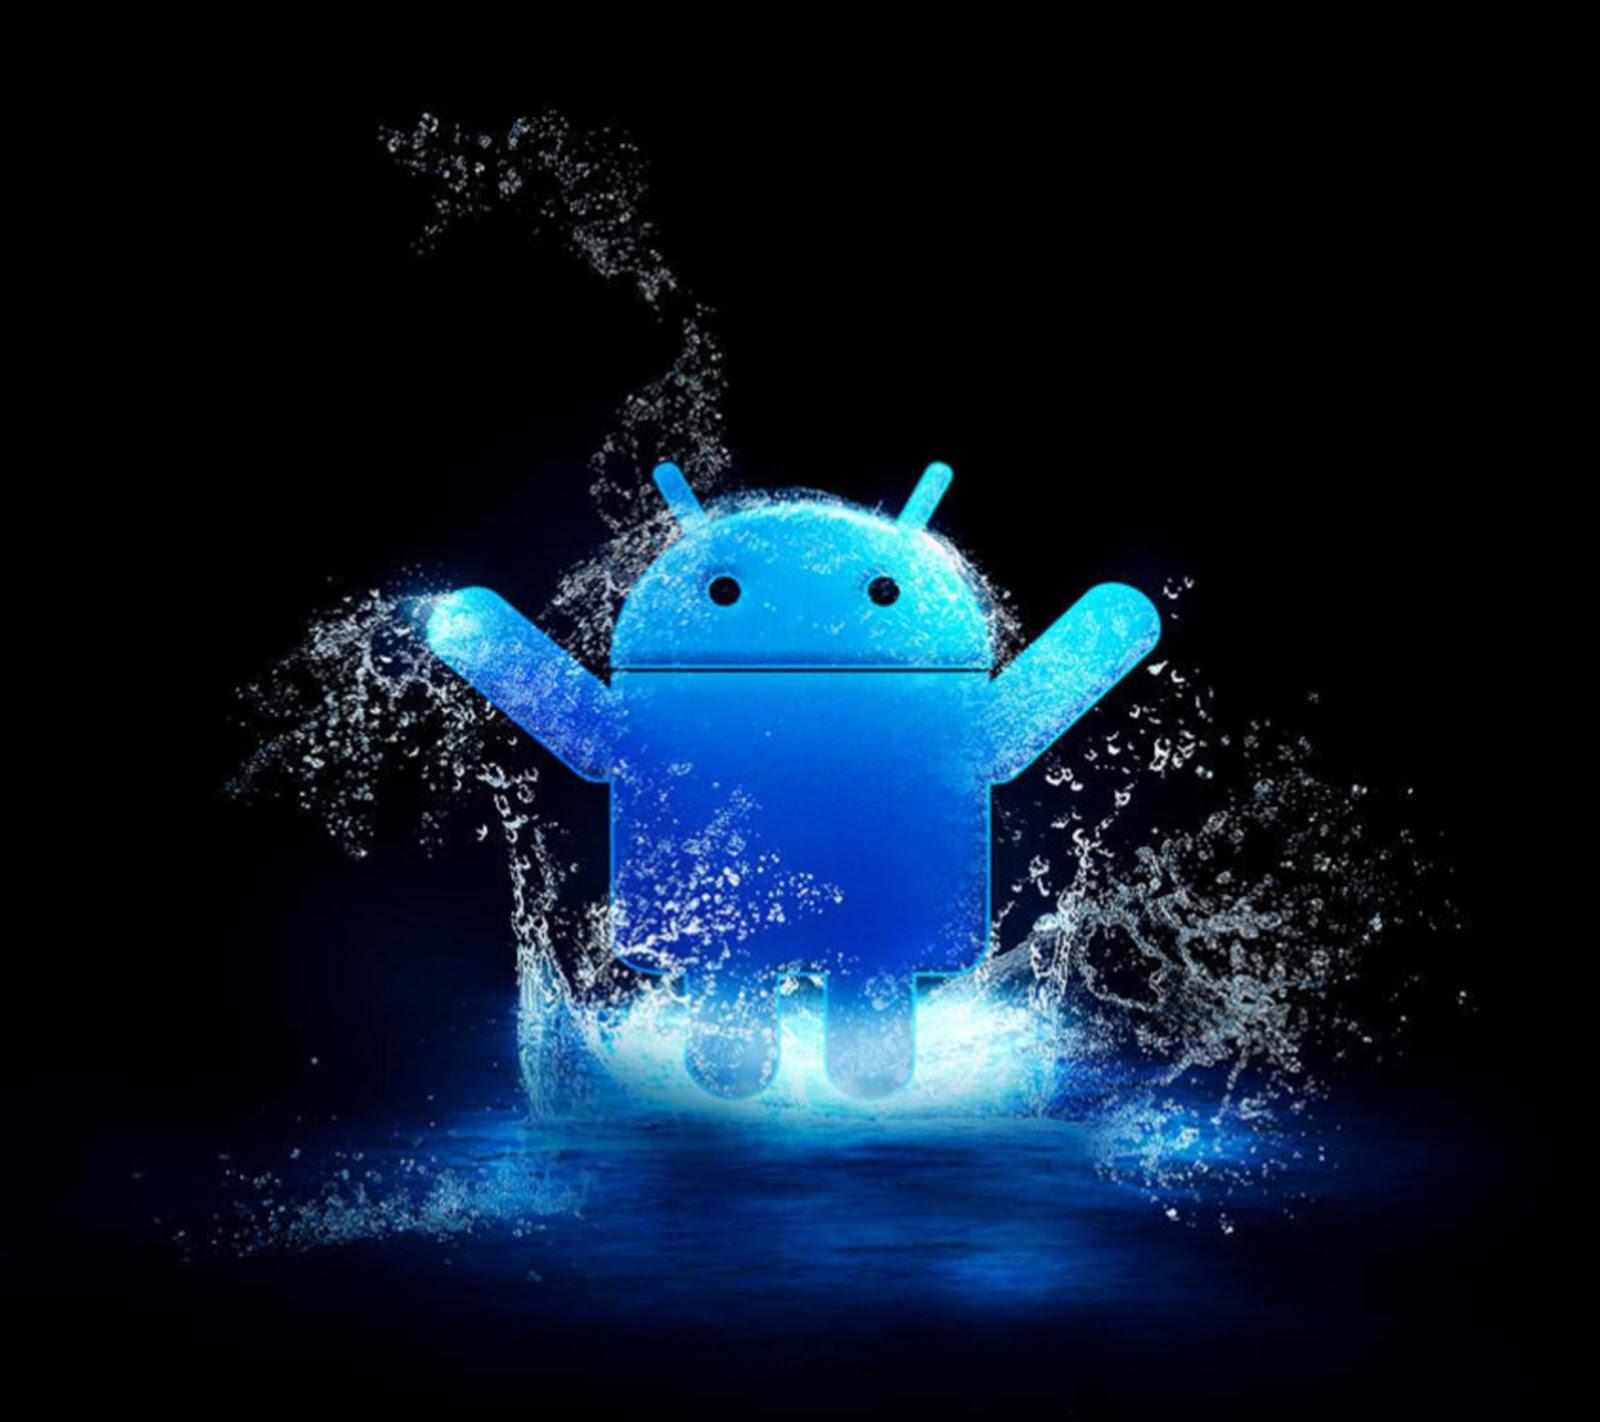 Top +25 Samsung Galaxy S4 Screen Saver Wallpapers